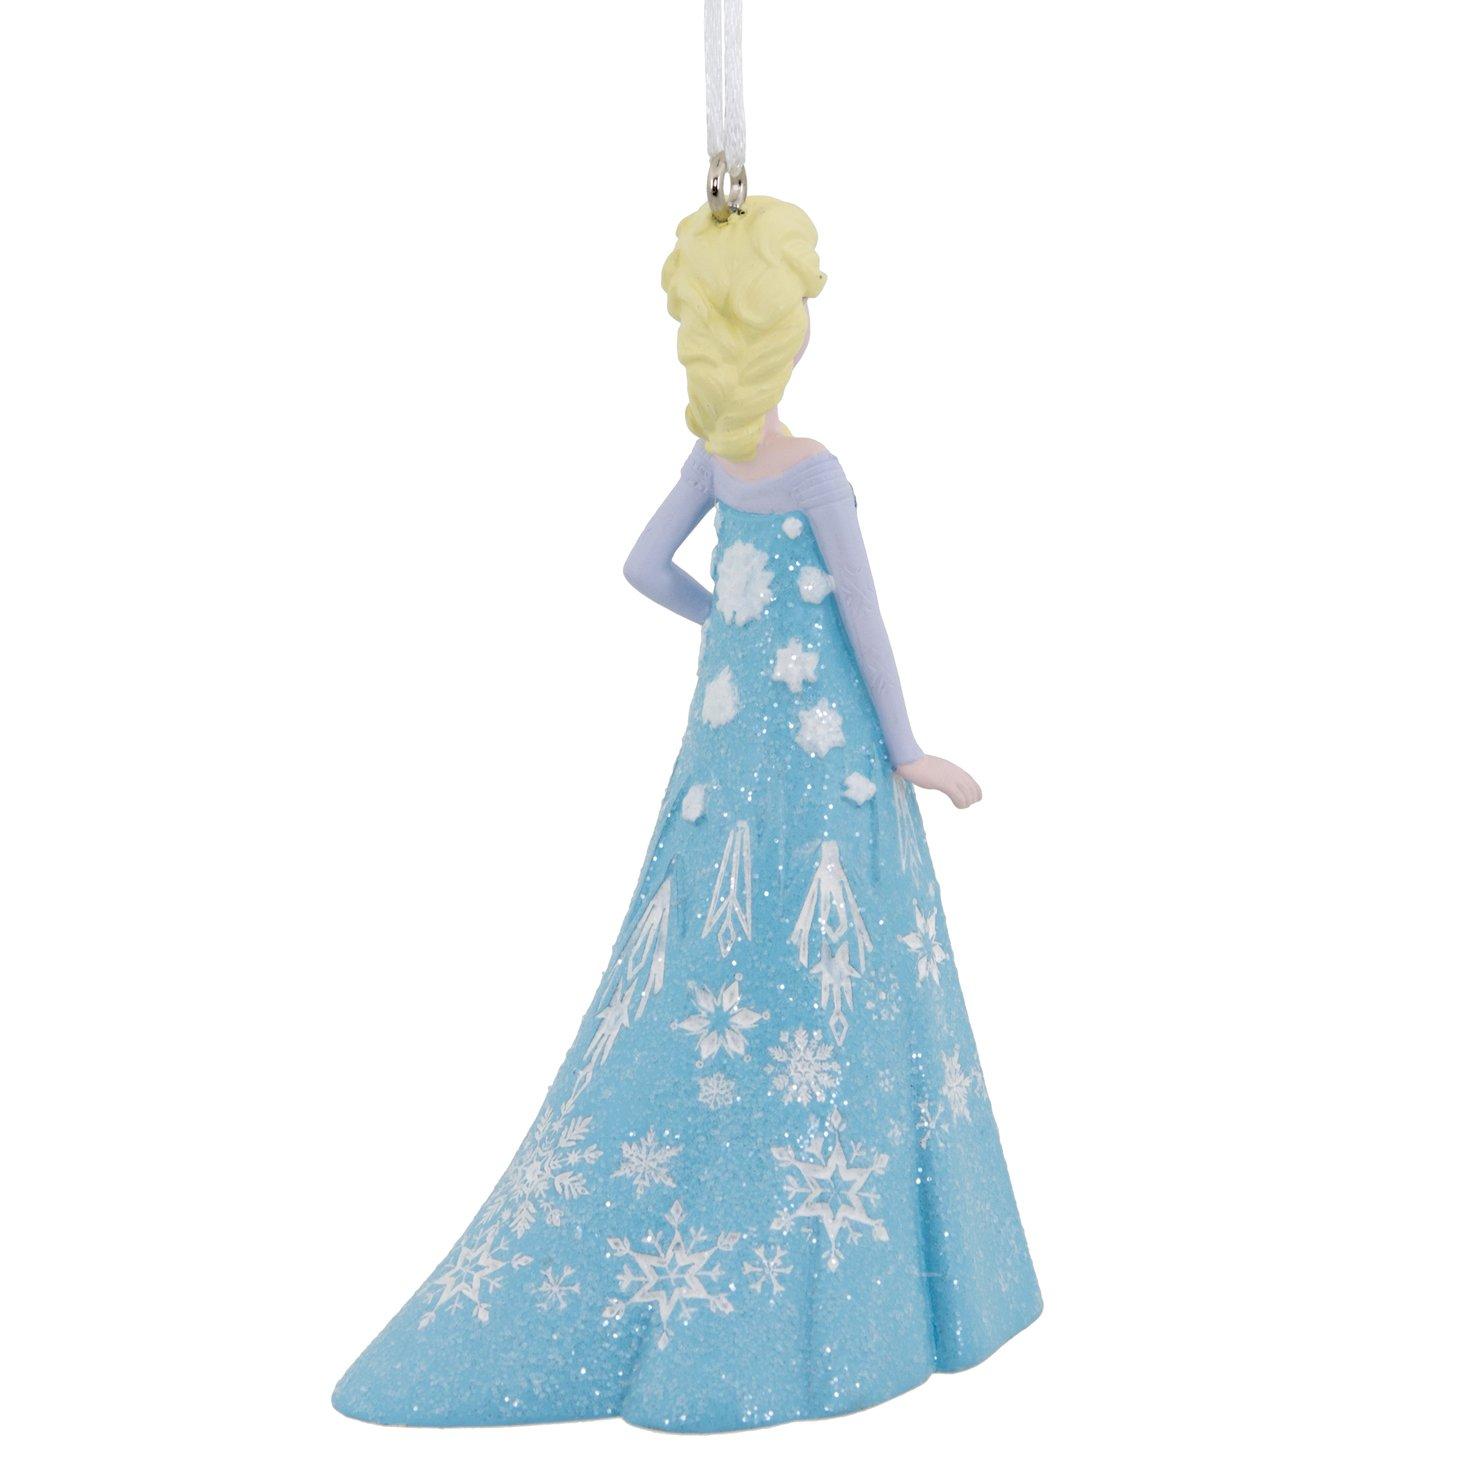 Amazon.com: Hallmark Disney Frozen Elsa Holiday Ornament: Home ...